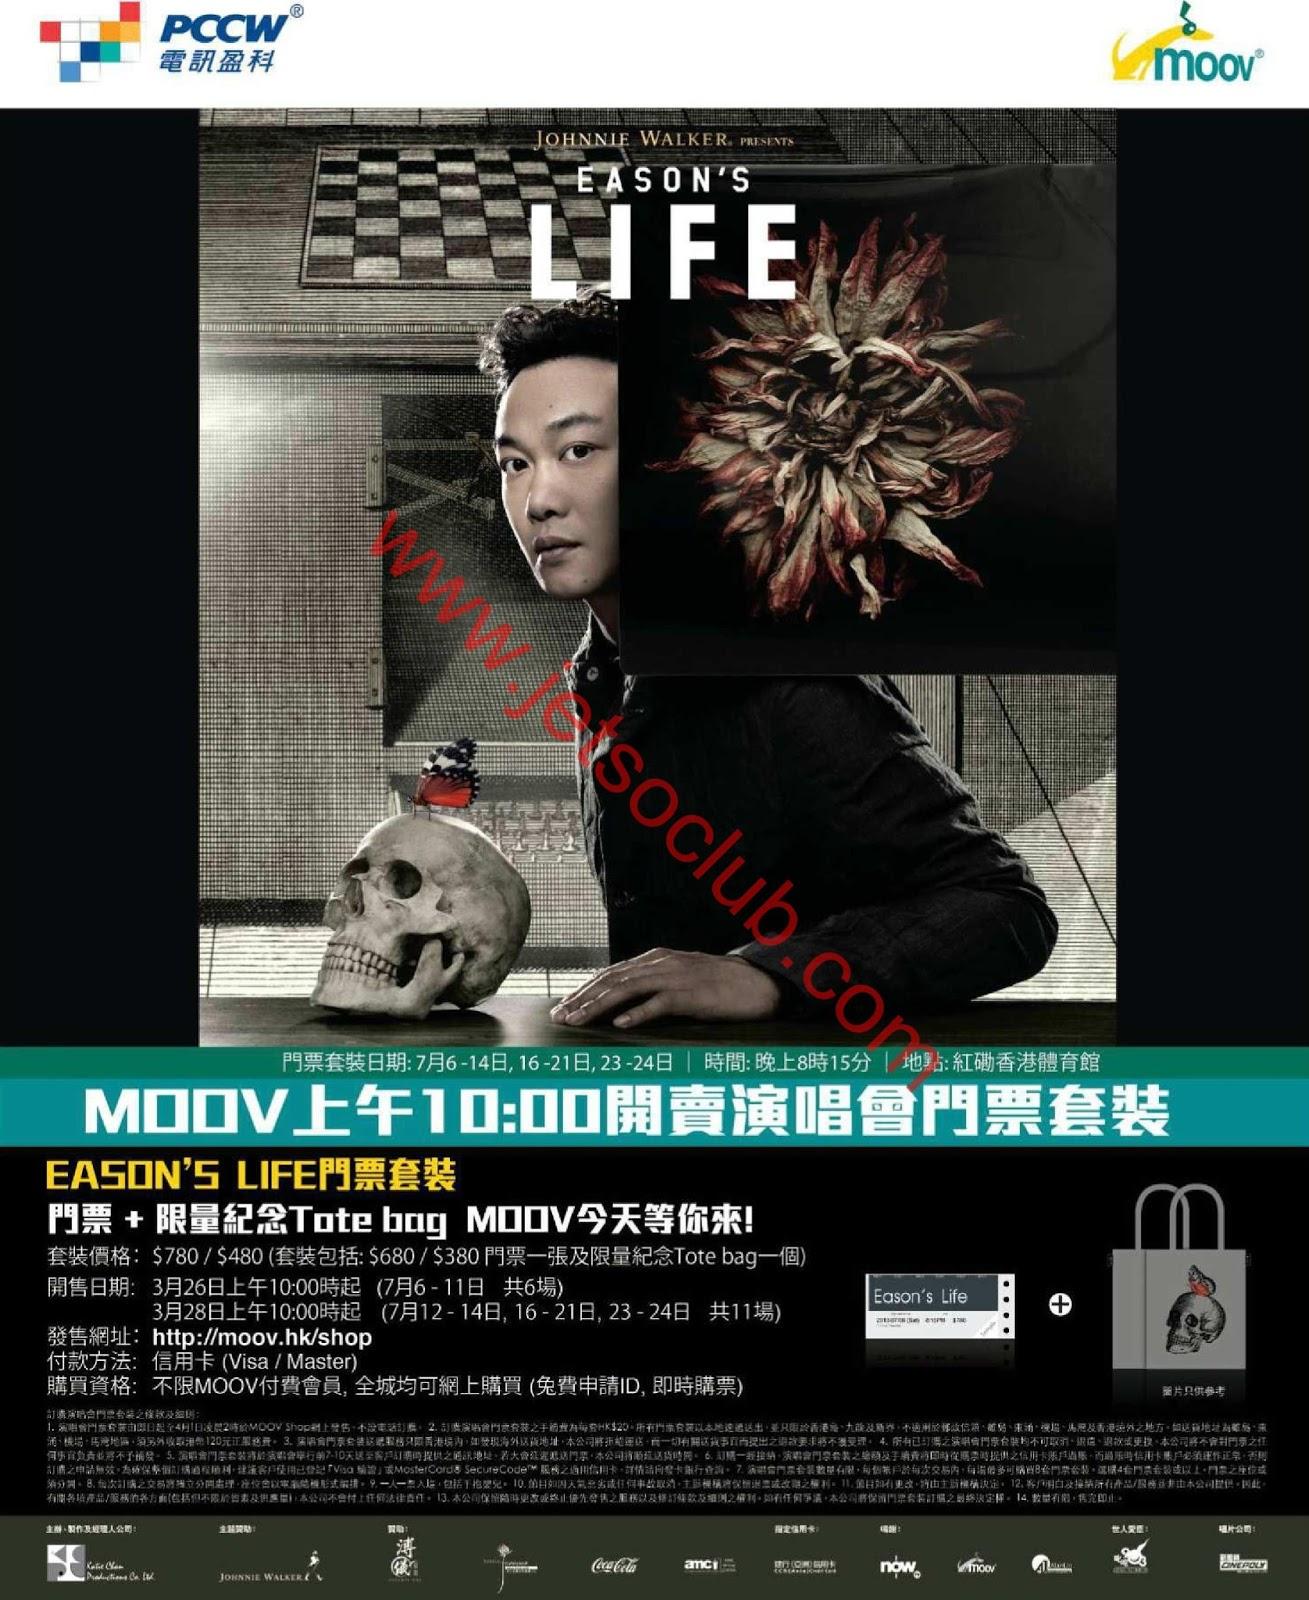 MOOV:陳奕迅香港演唱會2013門票套裝 公開發售(26/3起) ( Jetso Club 著數俱樂部 )